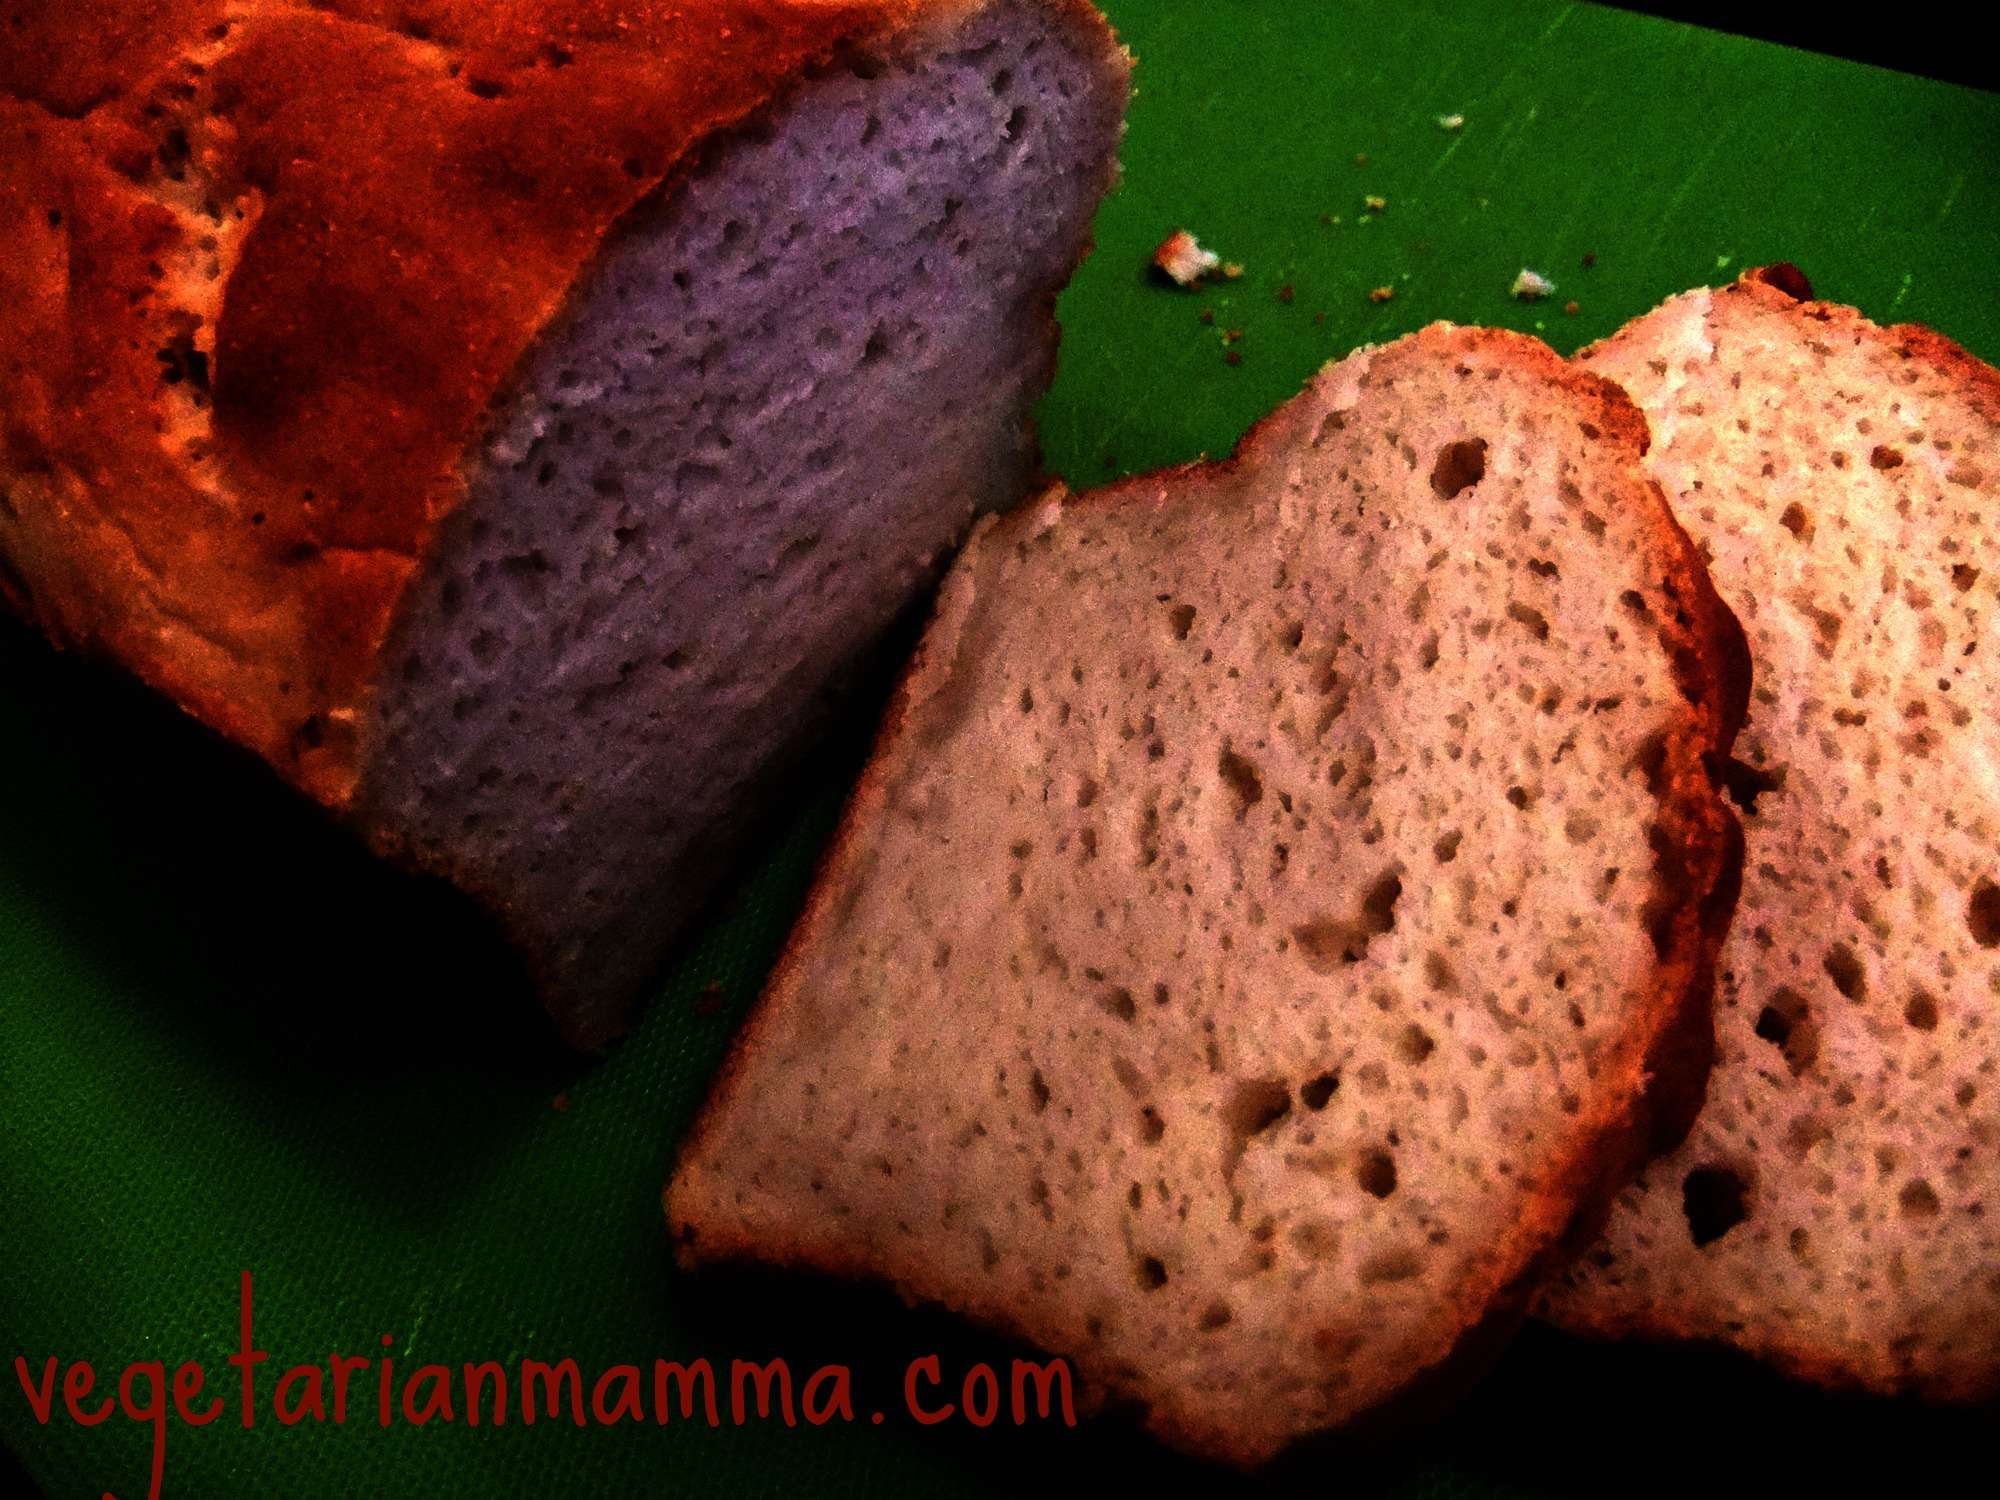 Homemade Amish Loaf Bread Gluten Free Betterbatter